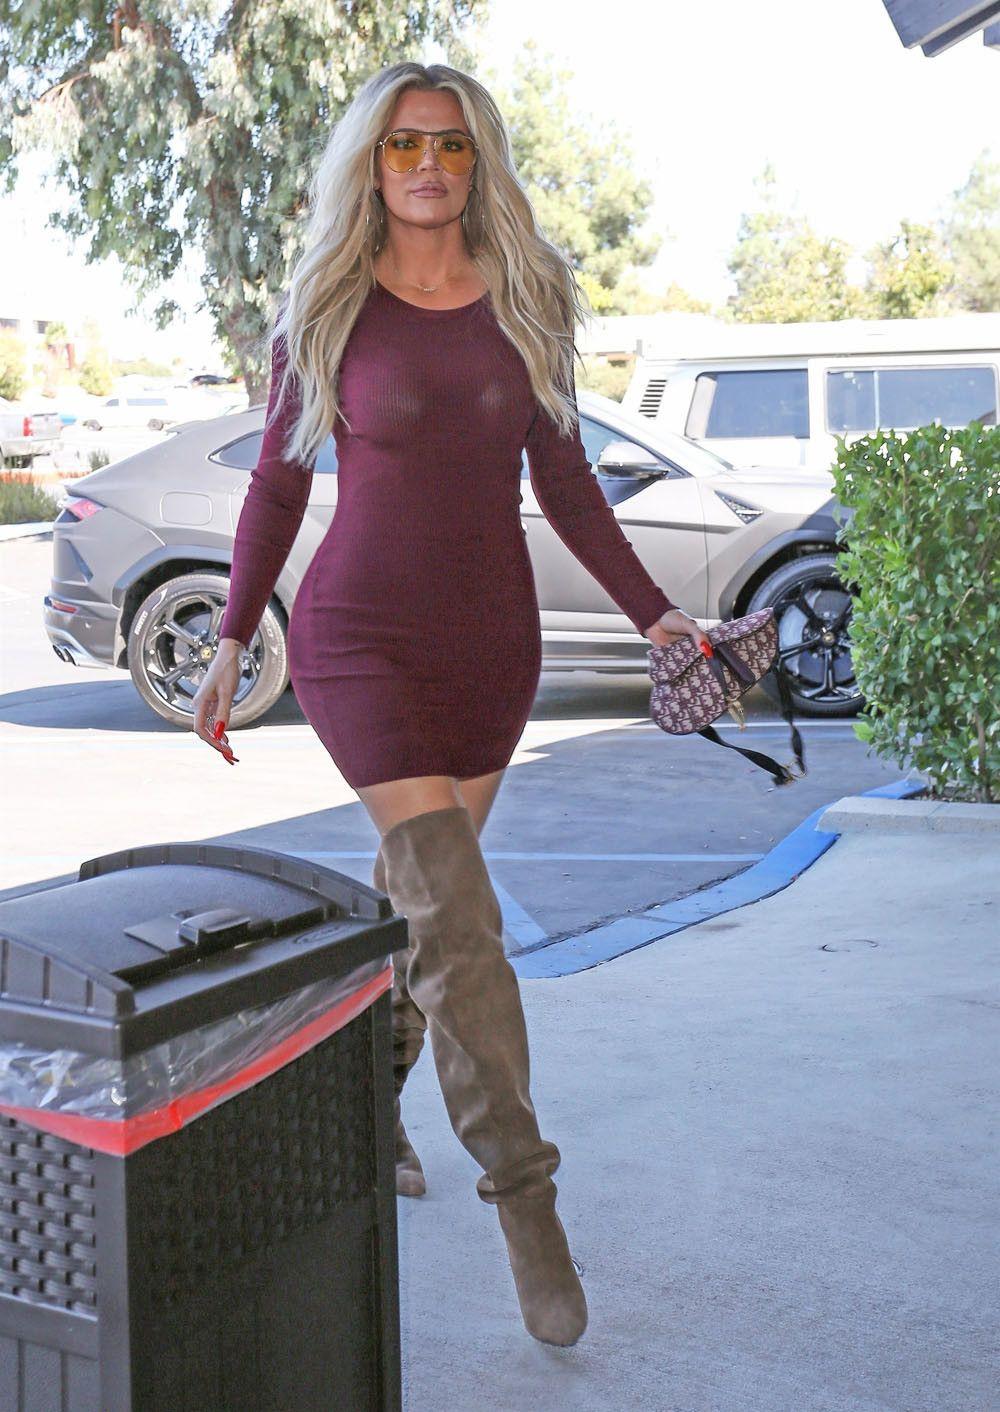 Khloe Kardashian's Sexiest Pics